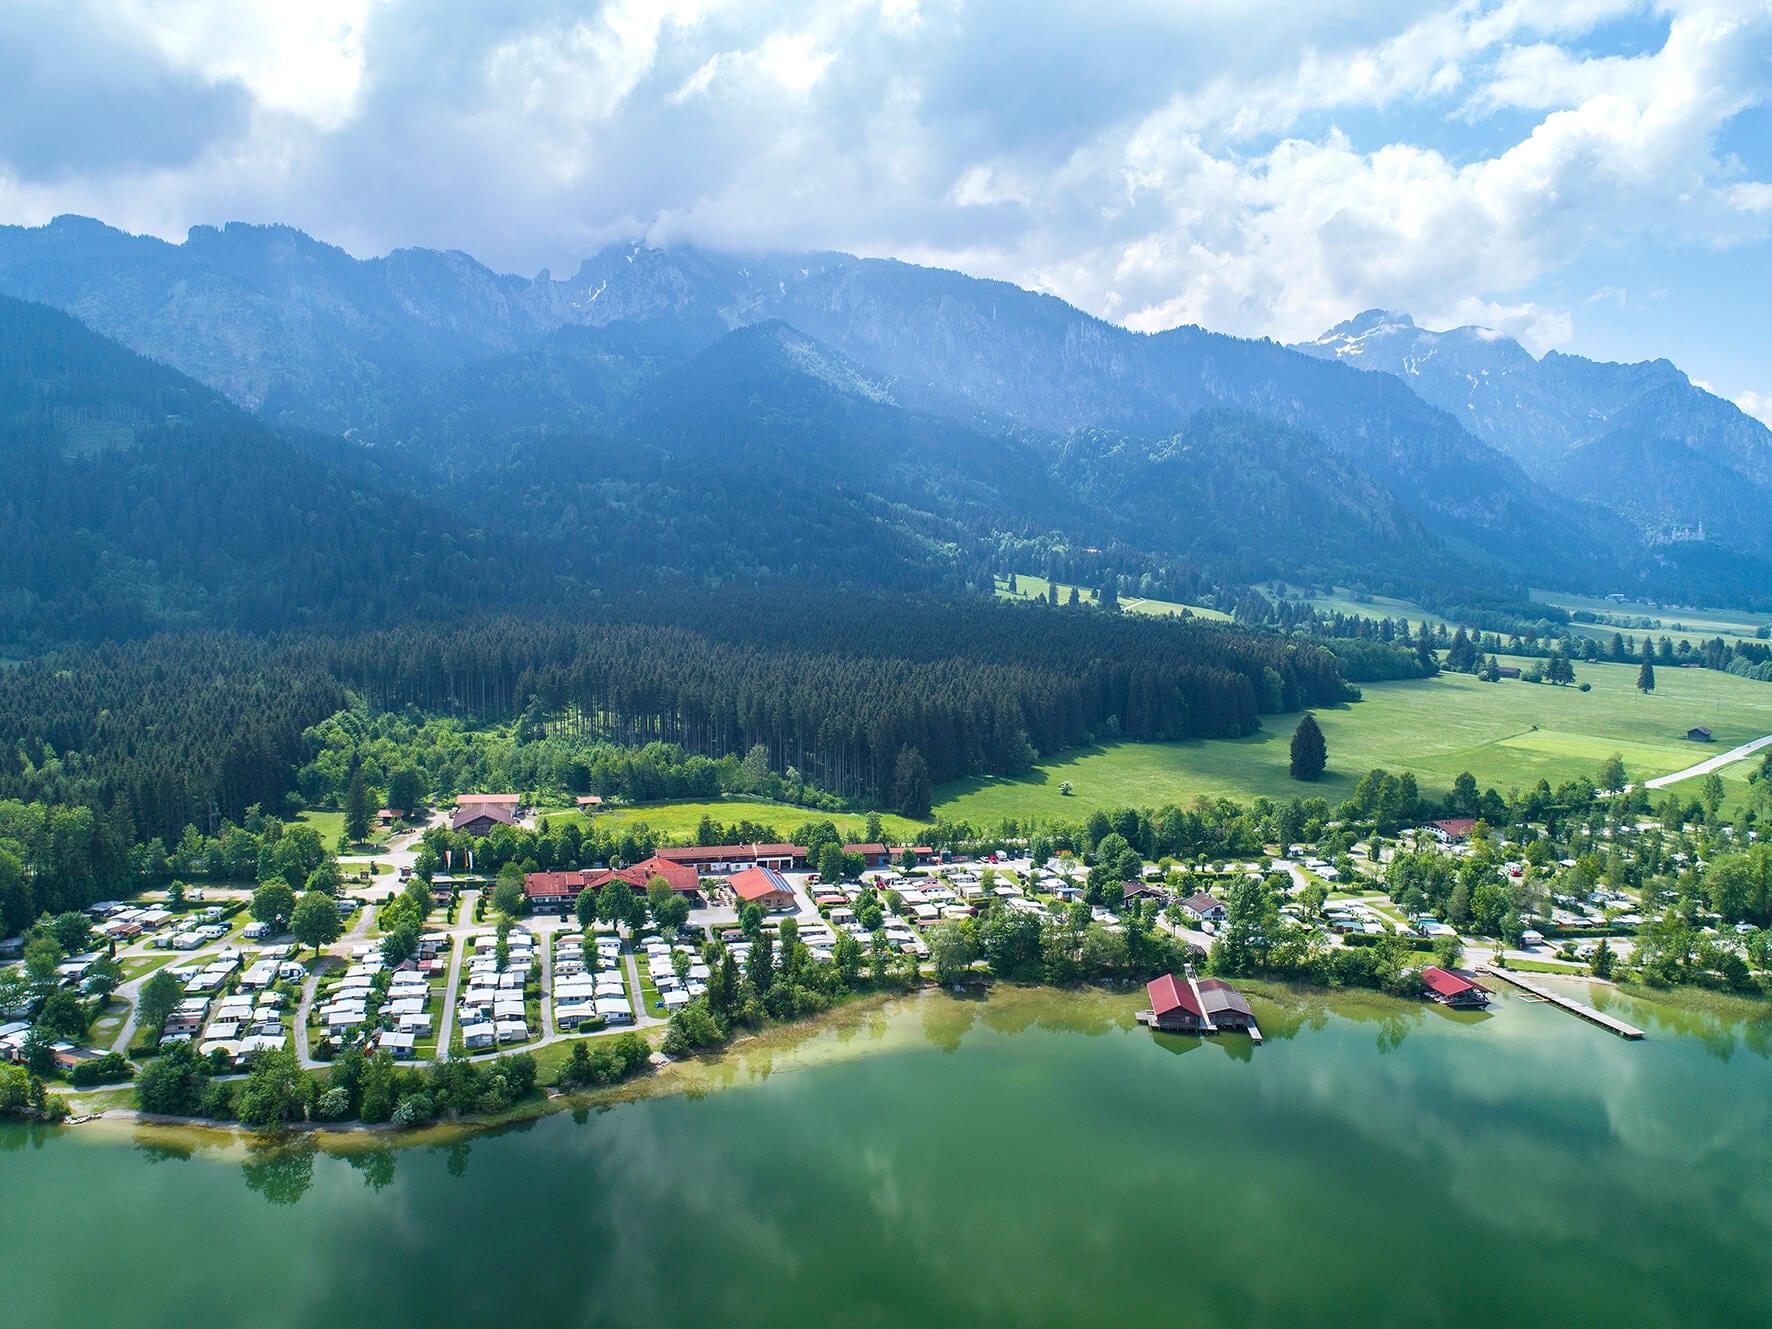 Campingplatz Bannwaldsee, Schwangau